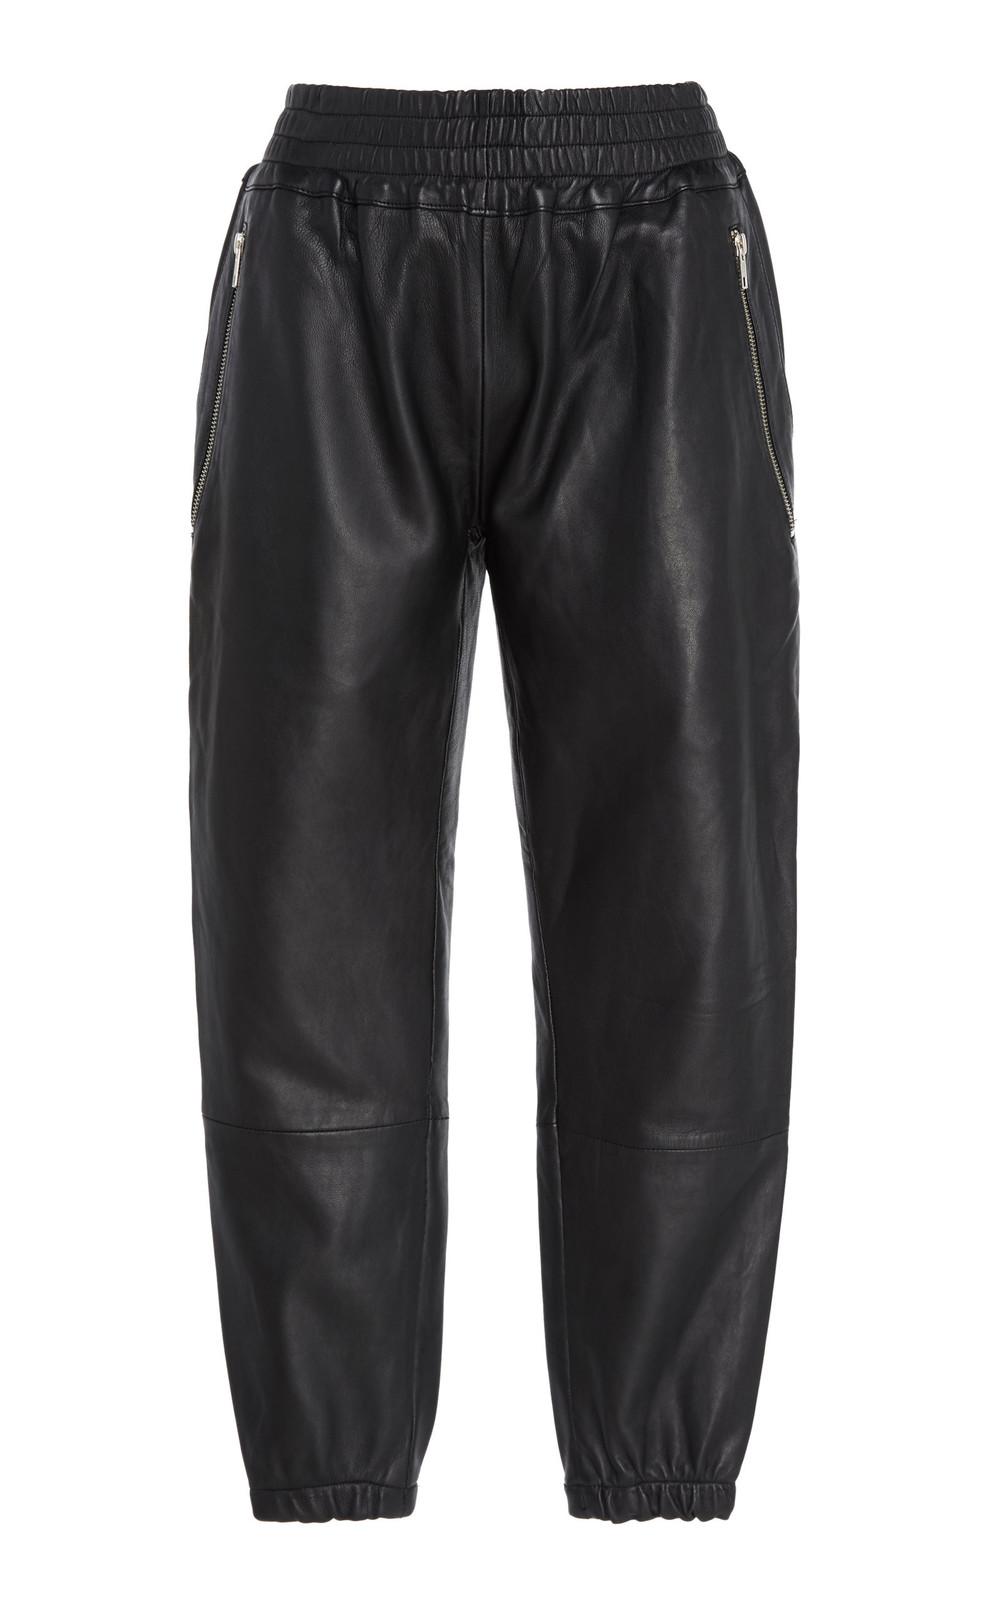 SemSem Horus Leather Pants in black